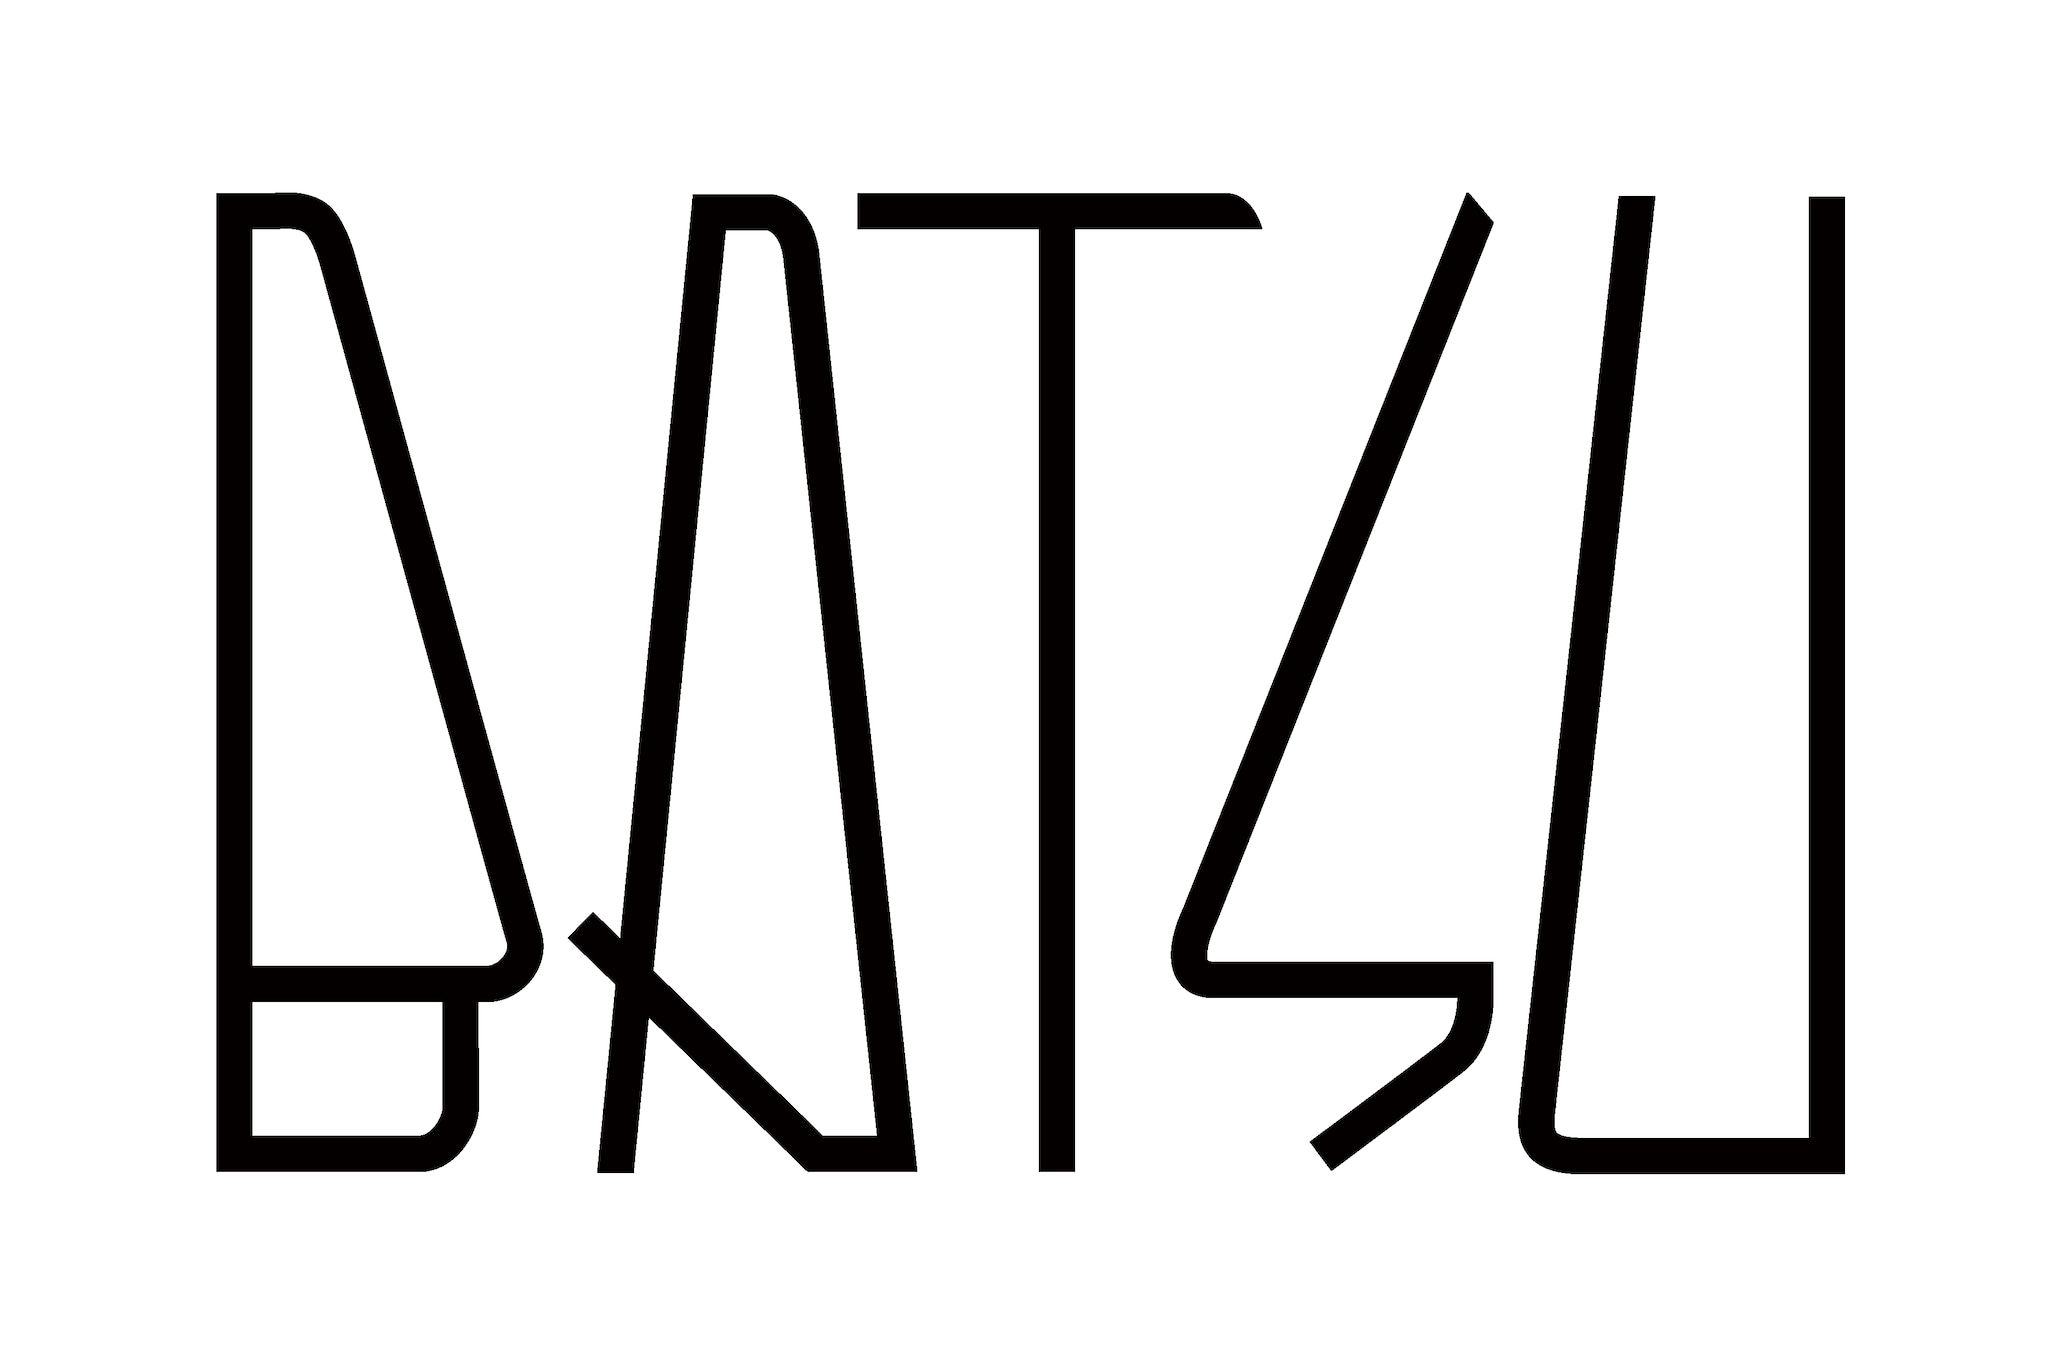 batsuskateboardshop